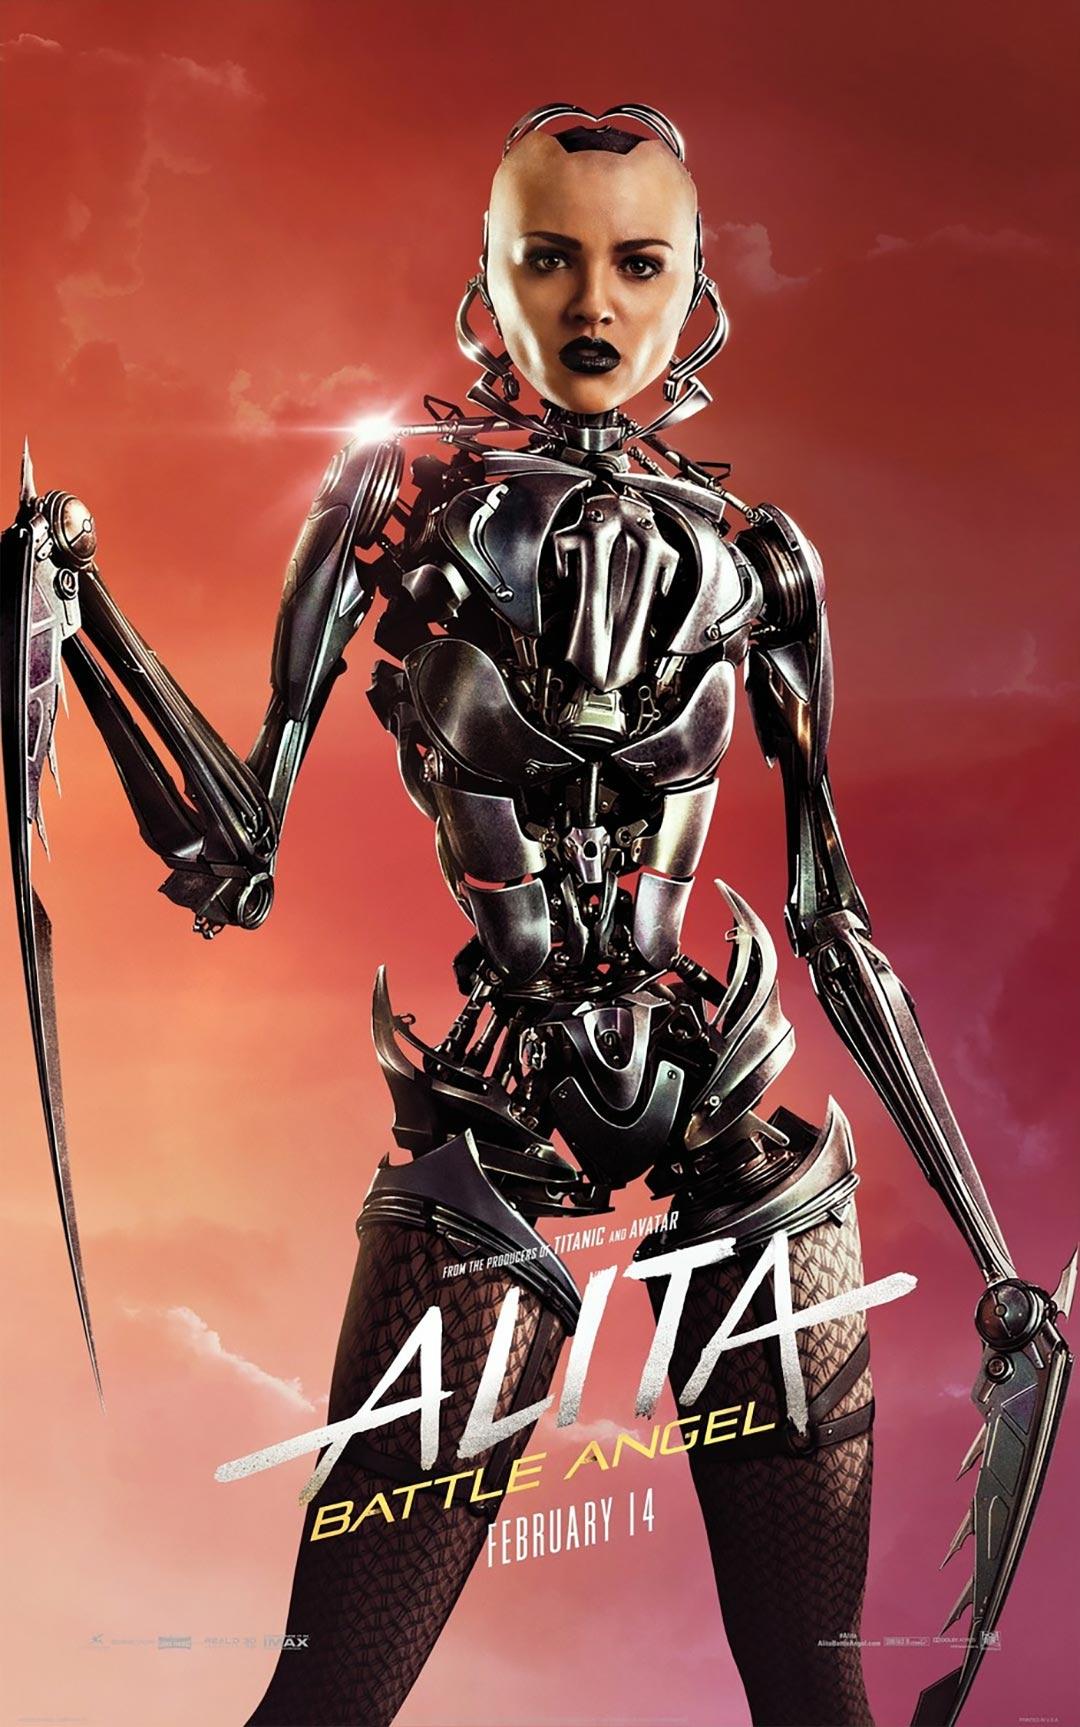 Alita: Battle Angel Poster #11